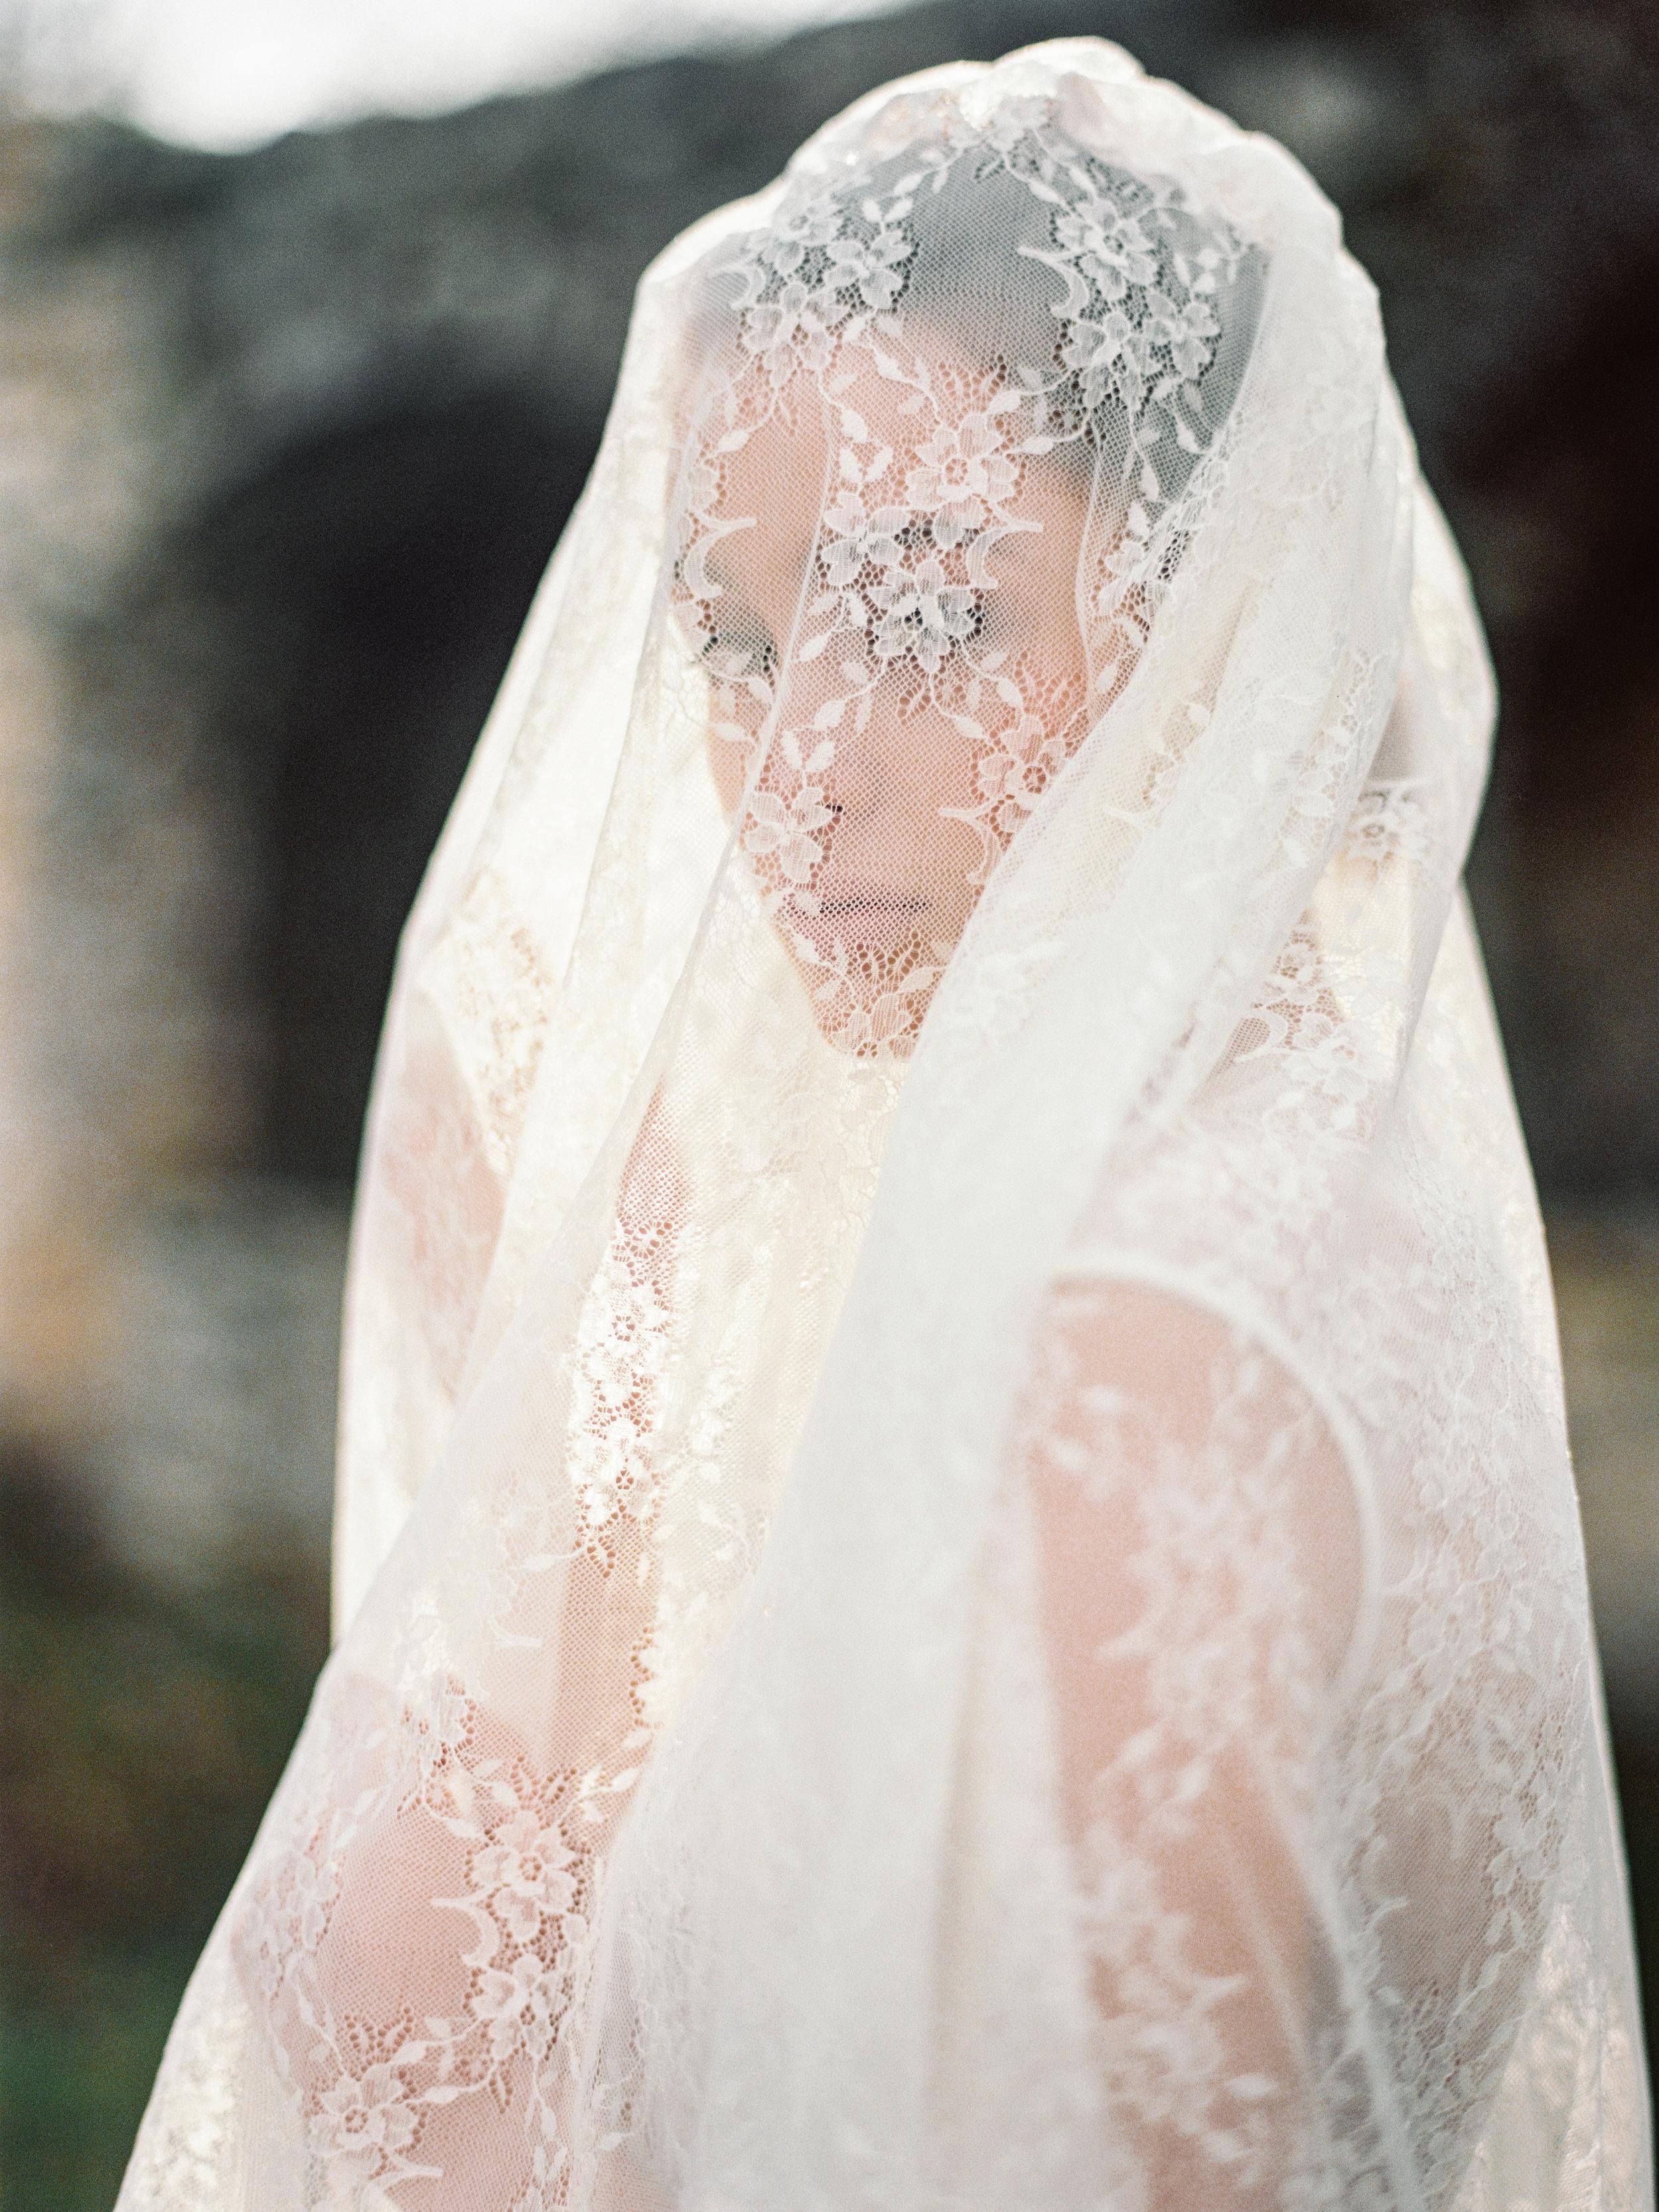 TamaraGigolaphotography,Cathytelle,royalweddingdress,kakheti-0044-6.JPG